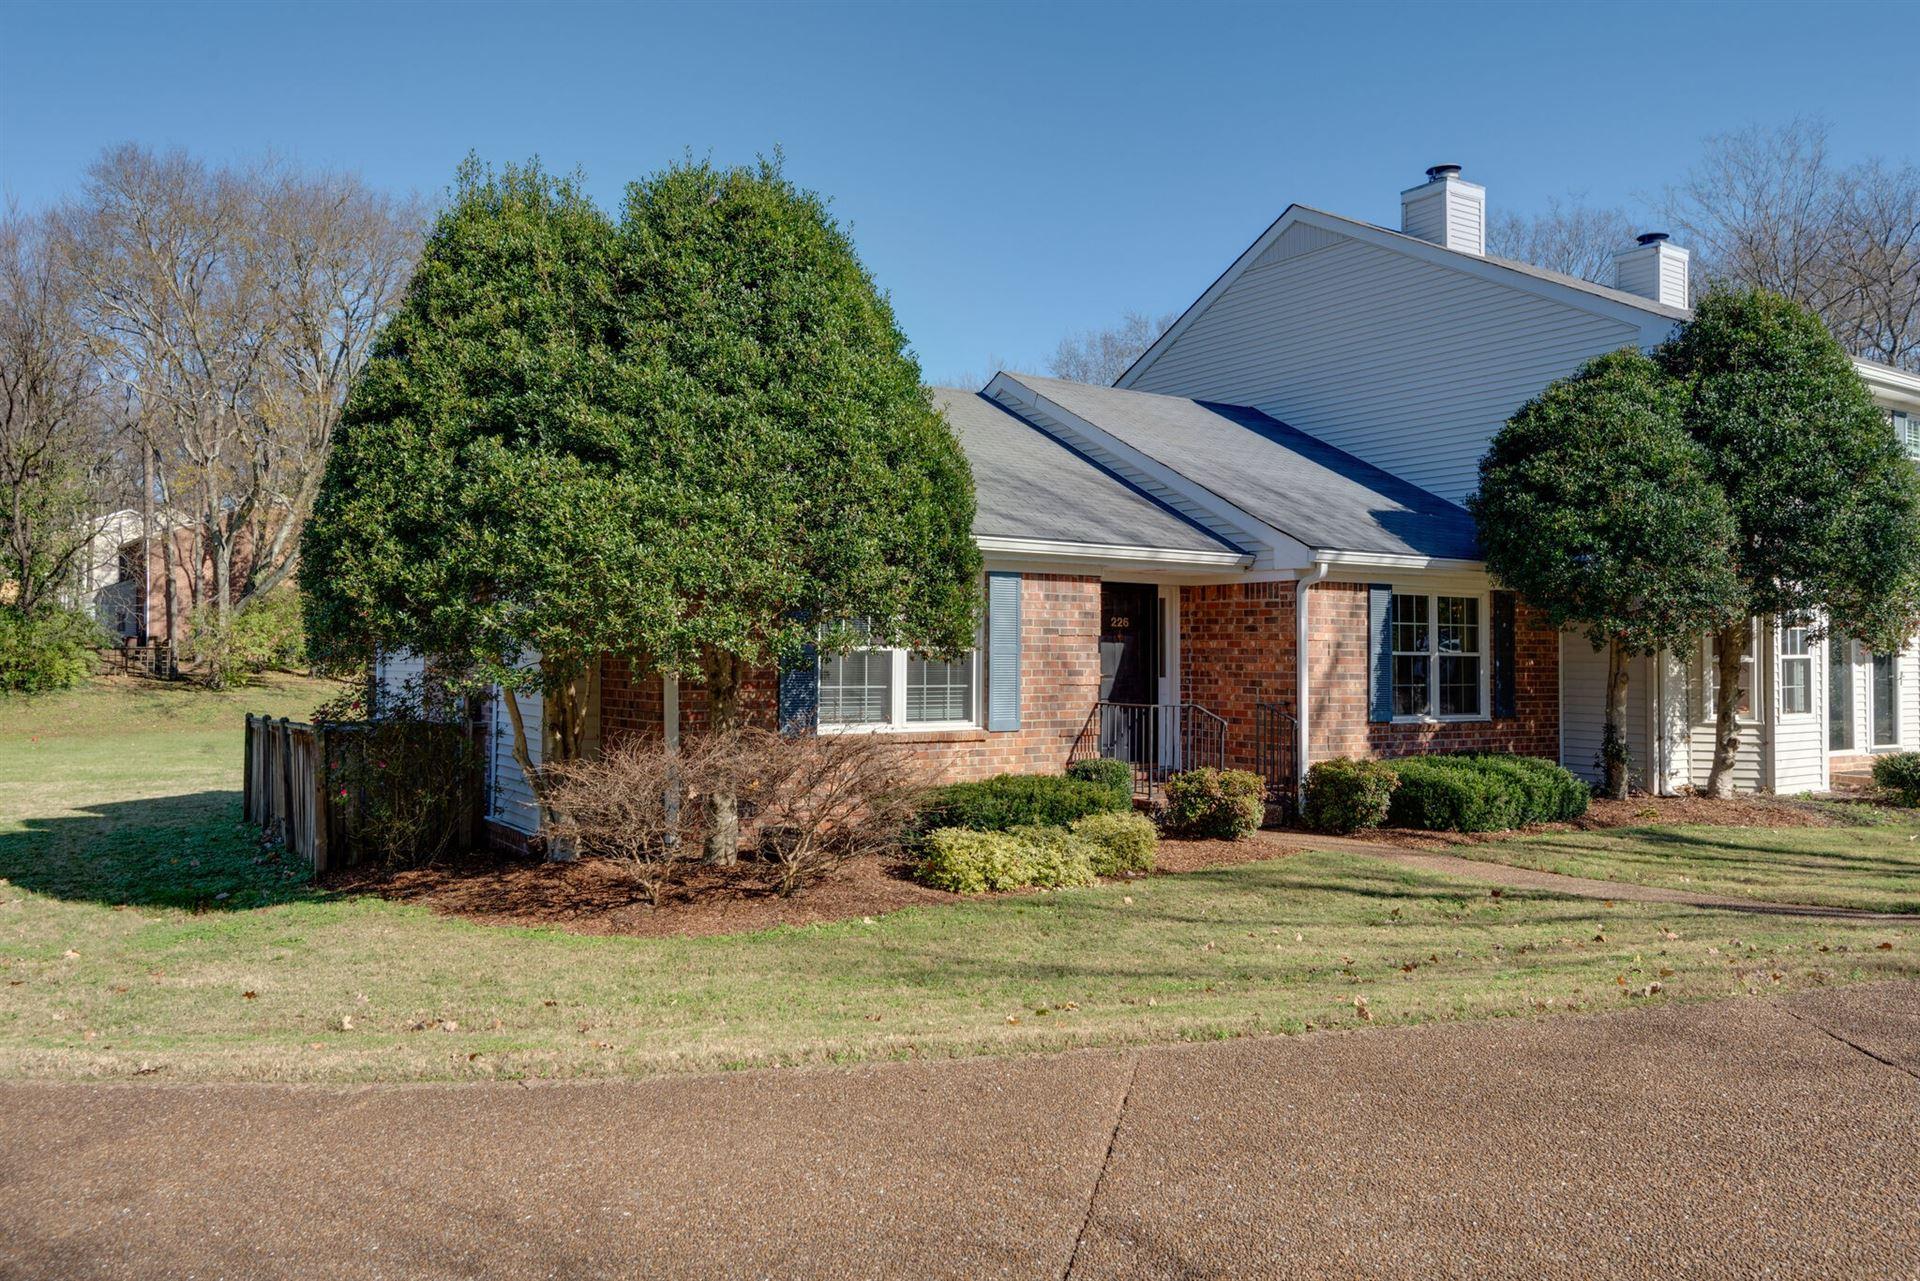 226 Brattlesboro Pl, Nashville, TN 37204 - MLS#: 2207566